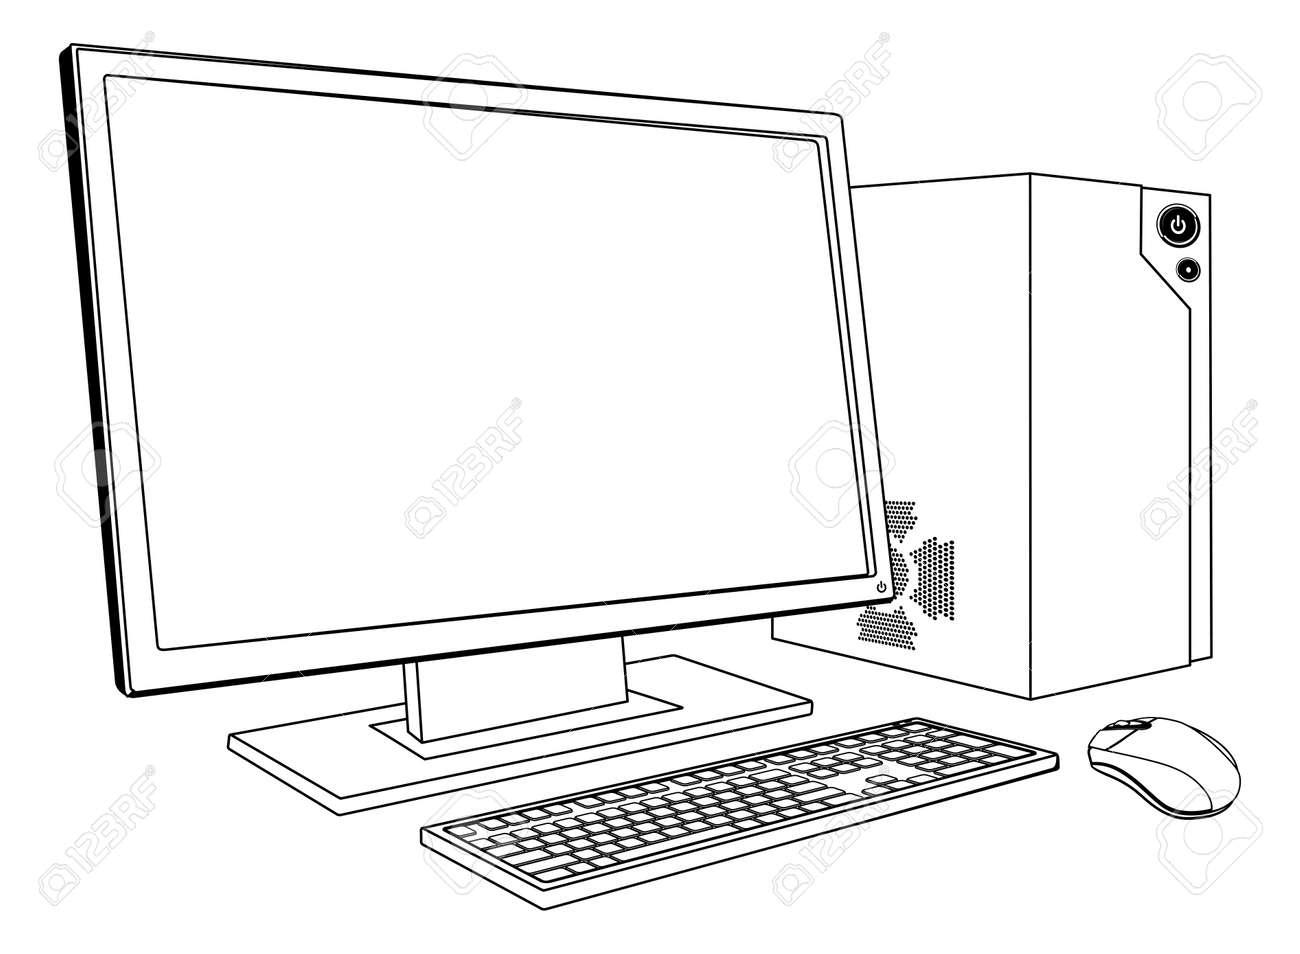 A Black And White Illustration Of Desktop Pc Computer Workstation